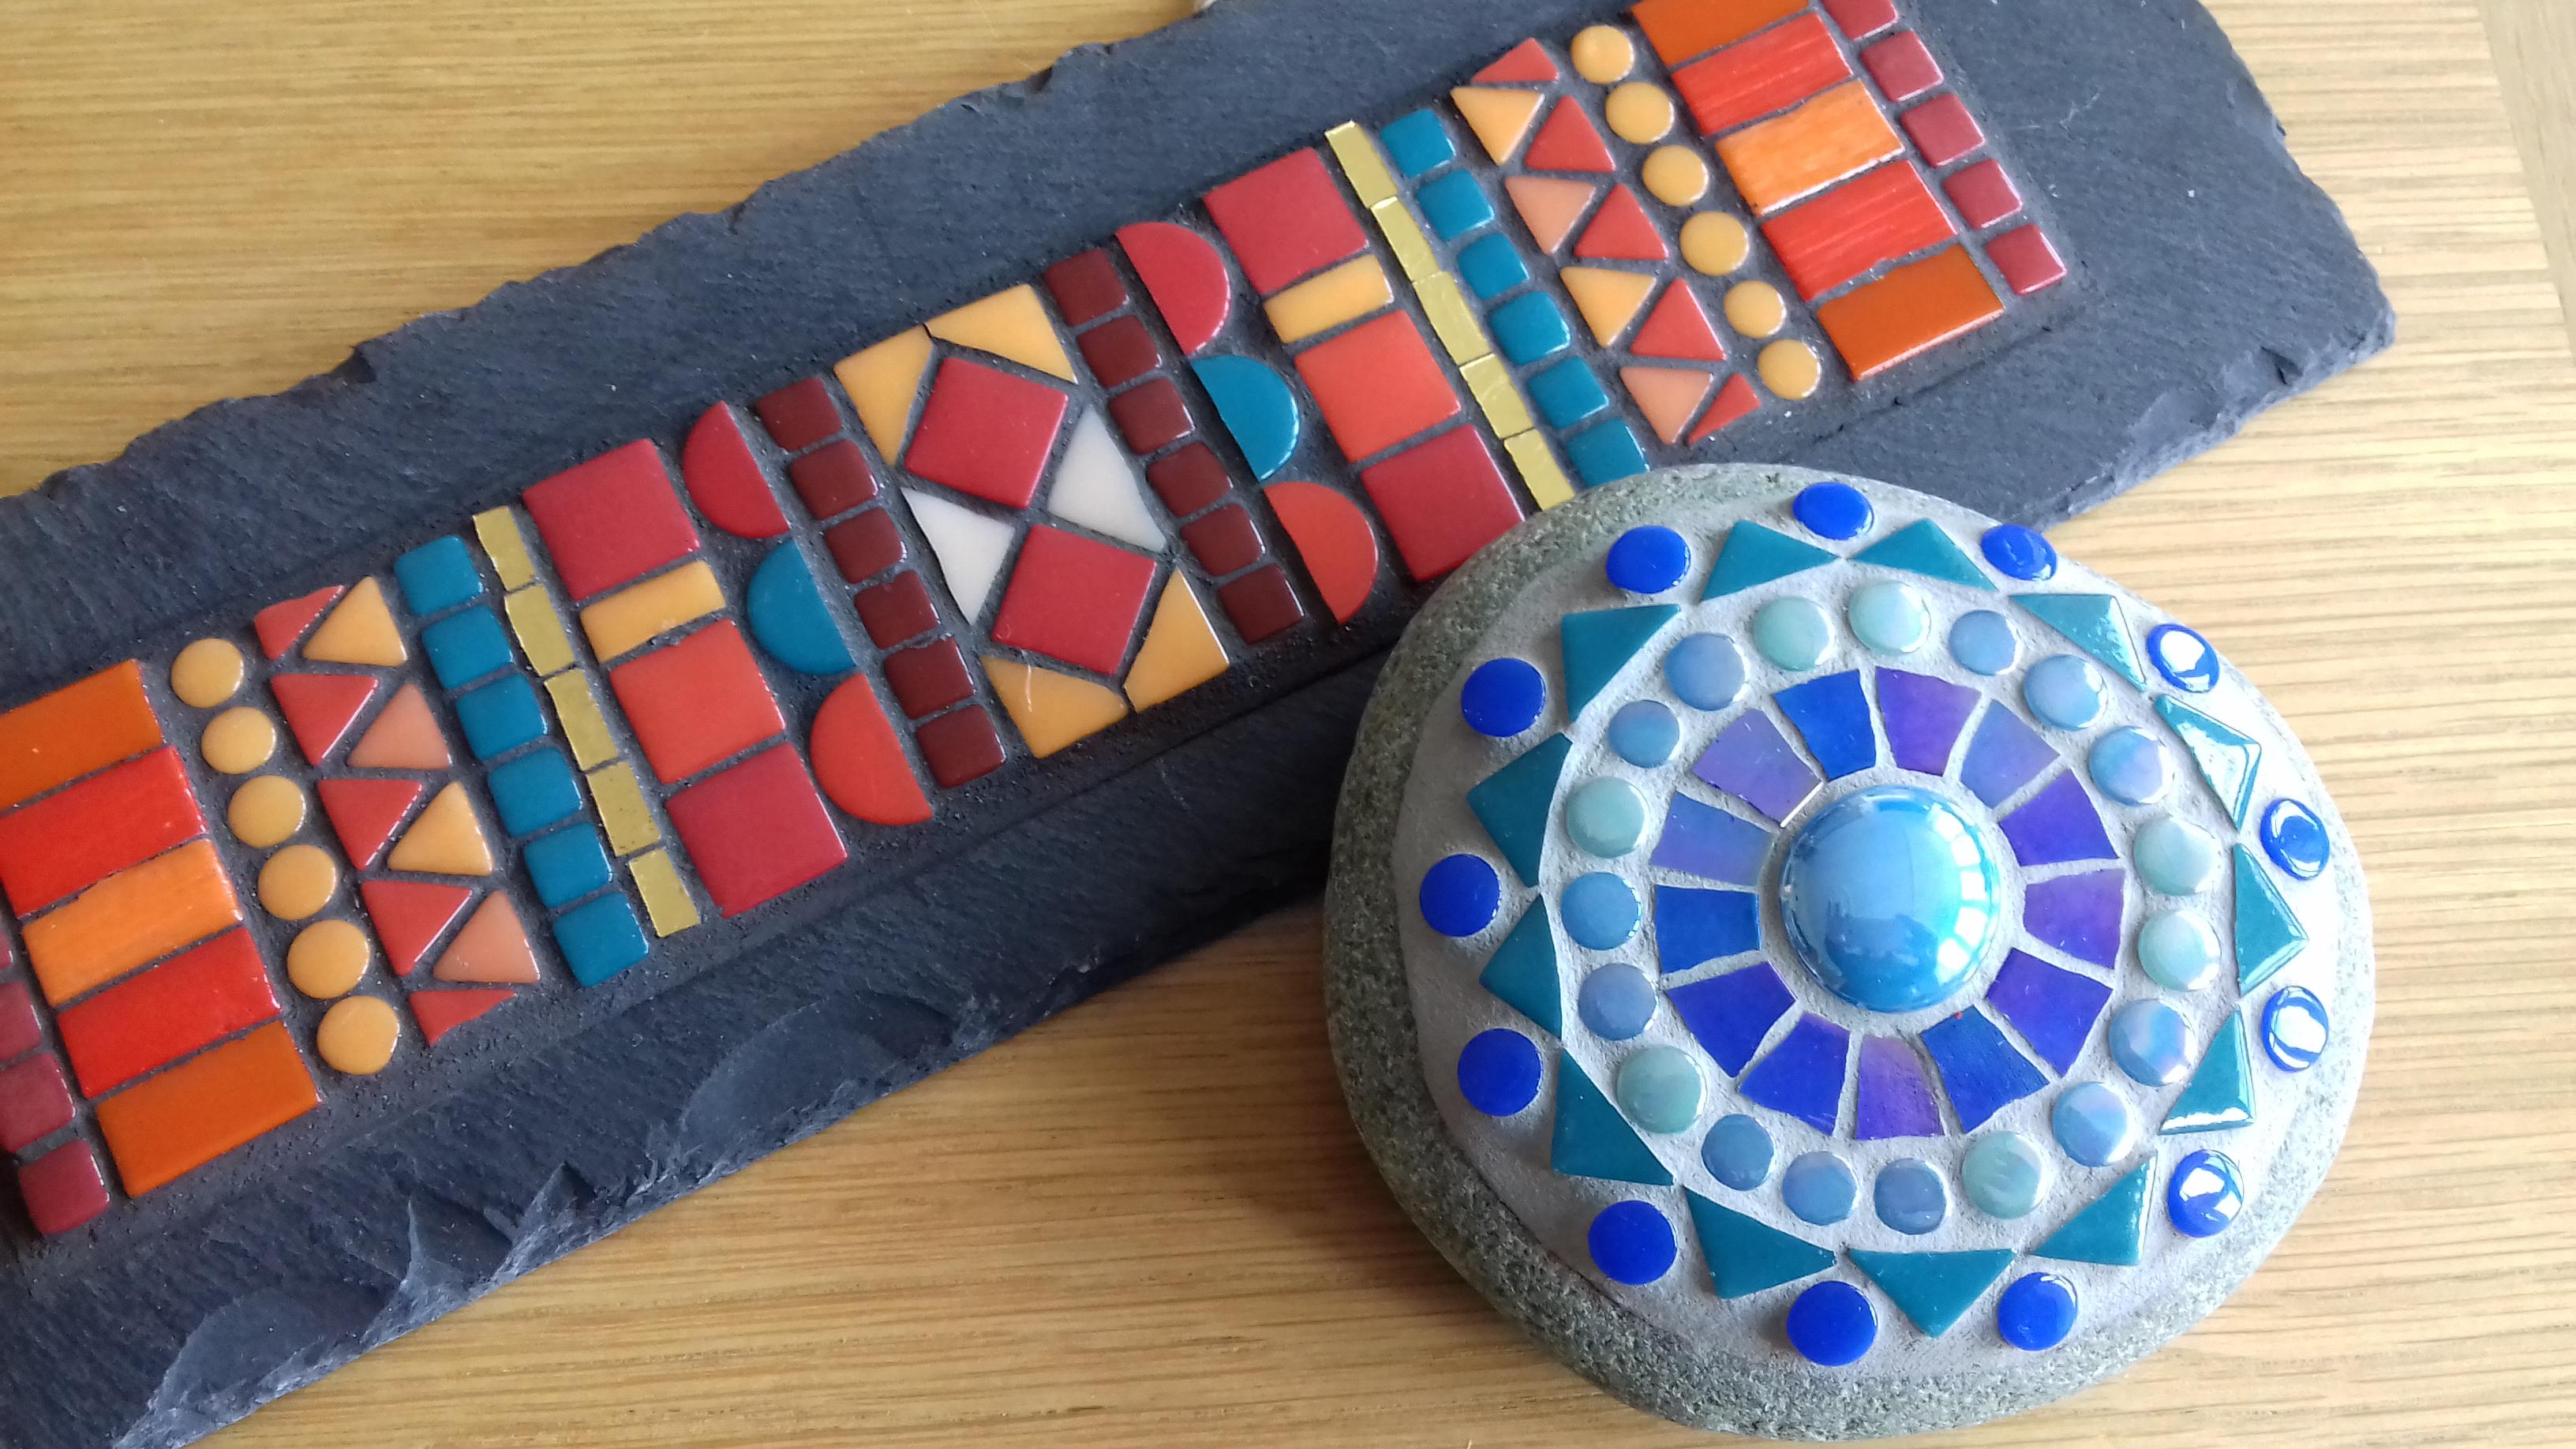 Mosaic on slate and stone